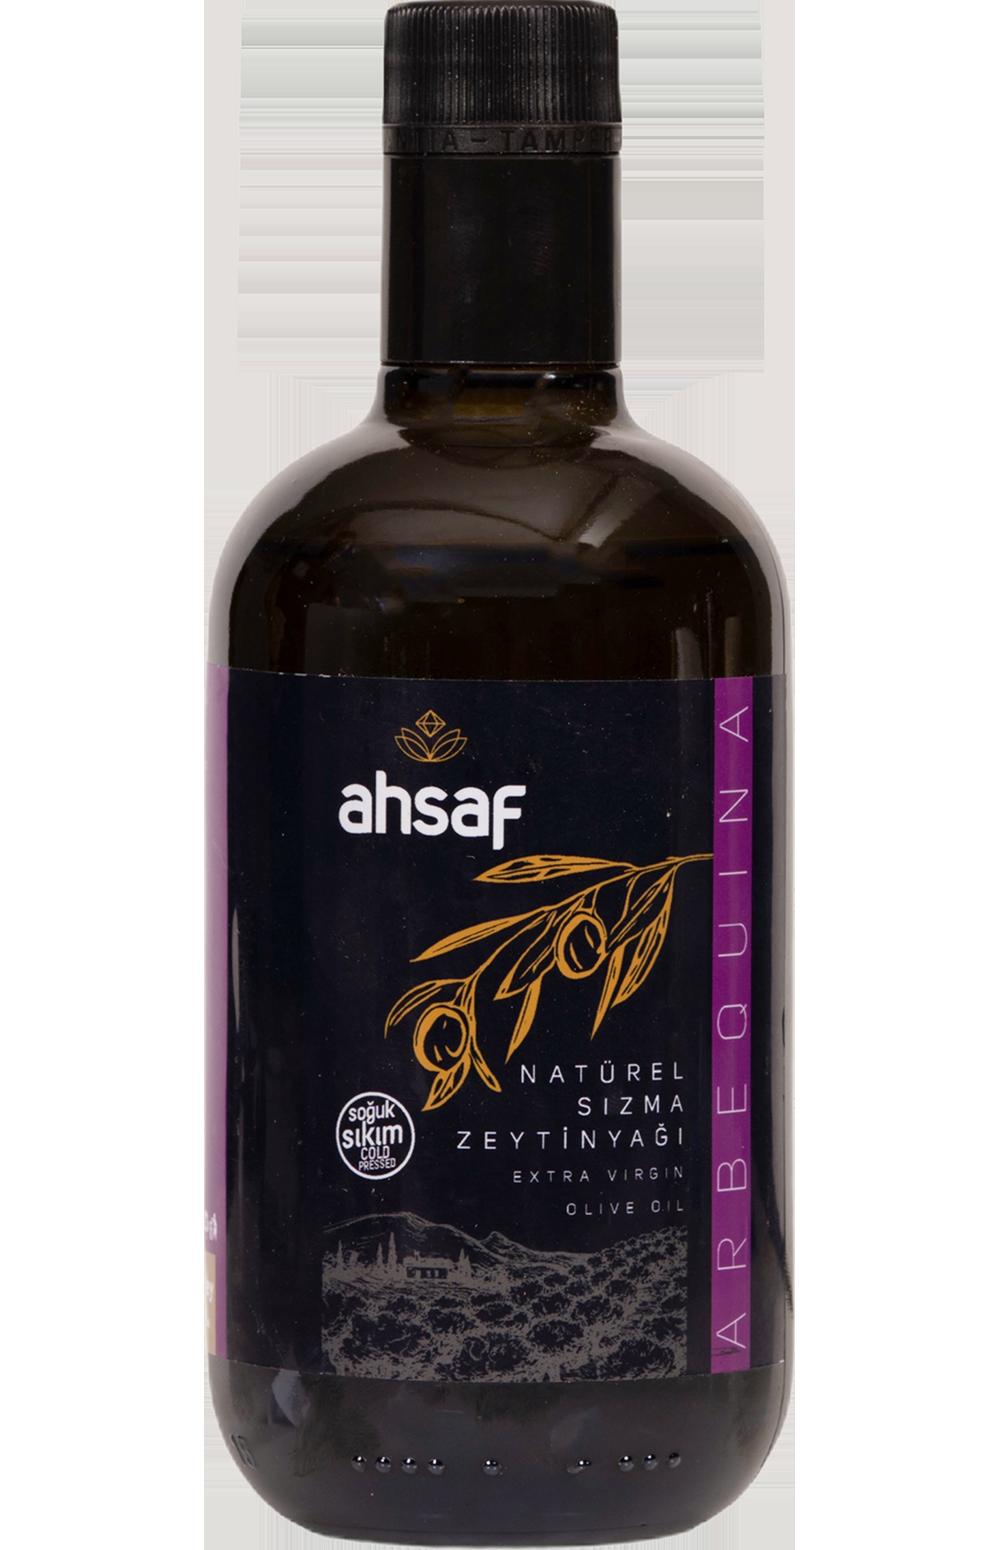 Ahsaf- Arbequina